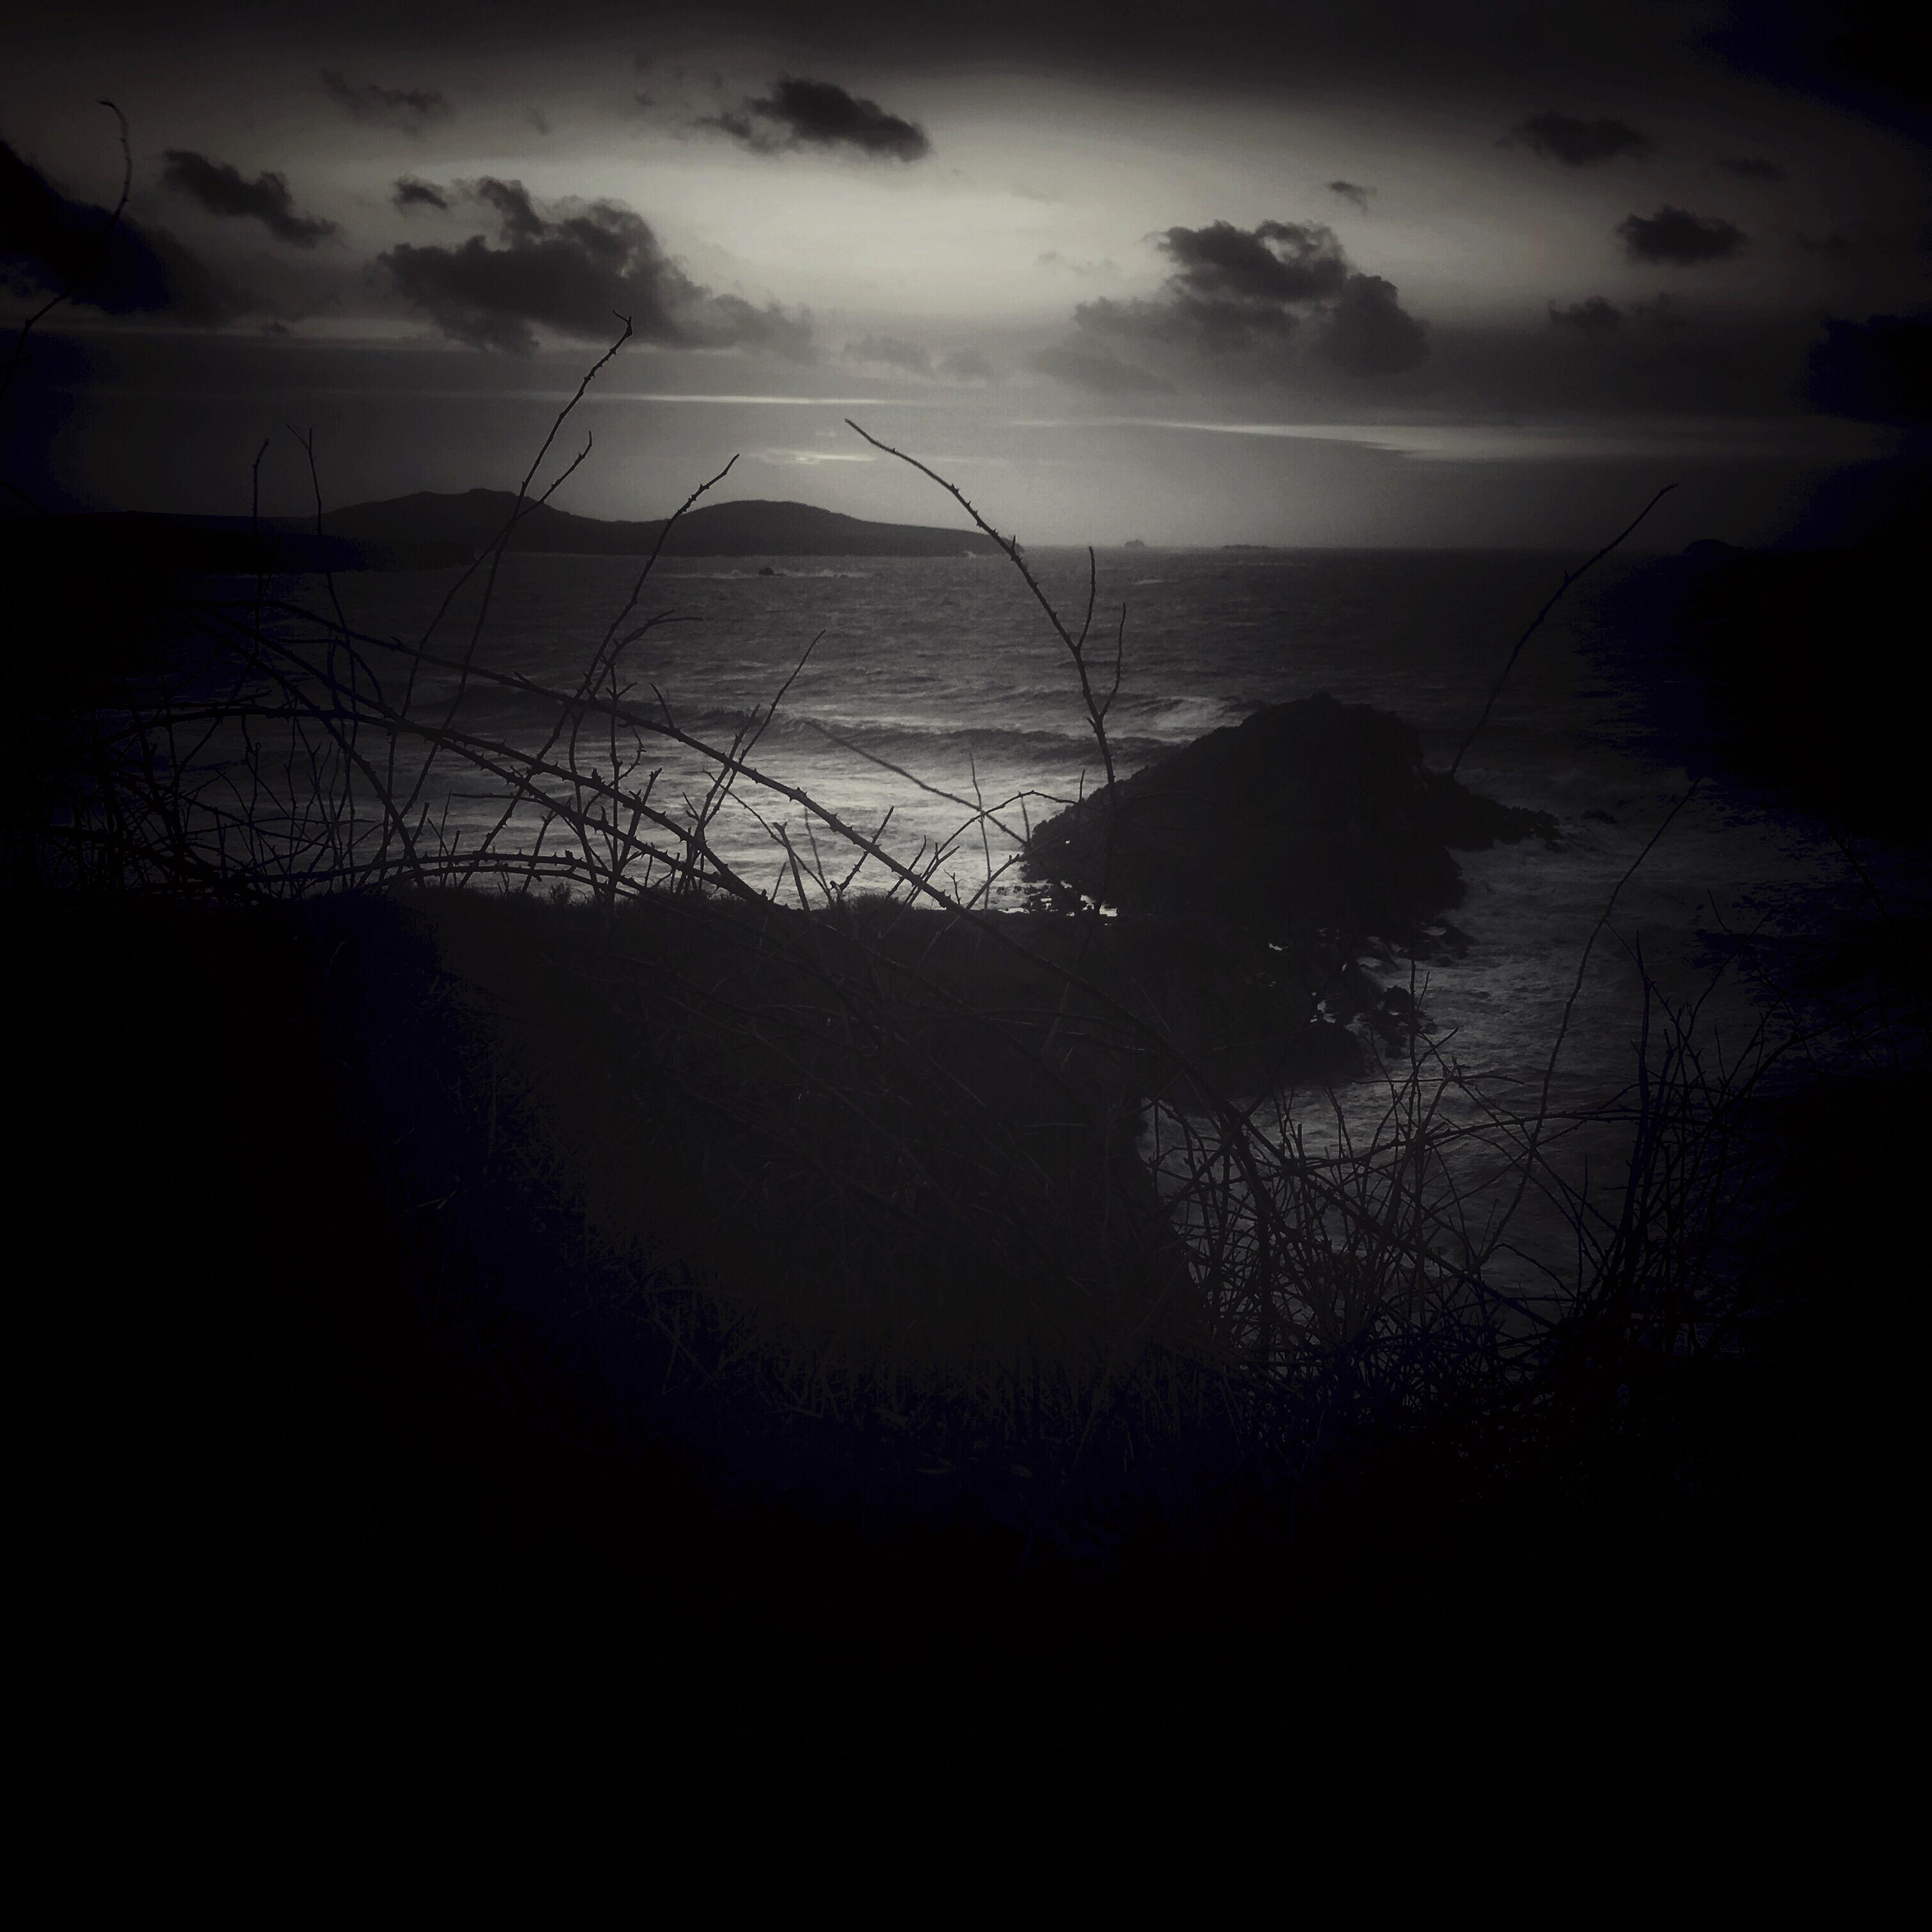 Dusk at Whitesands Bay